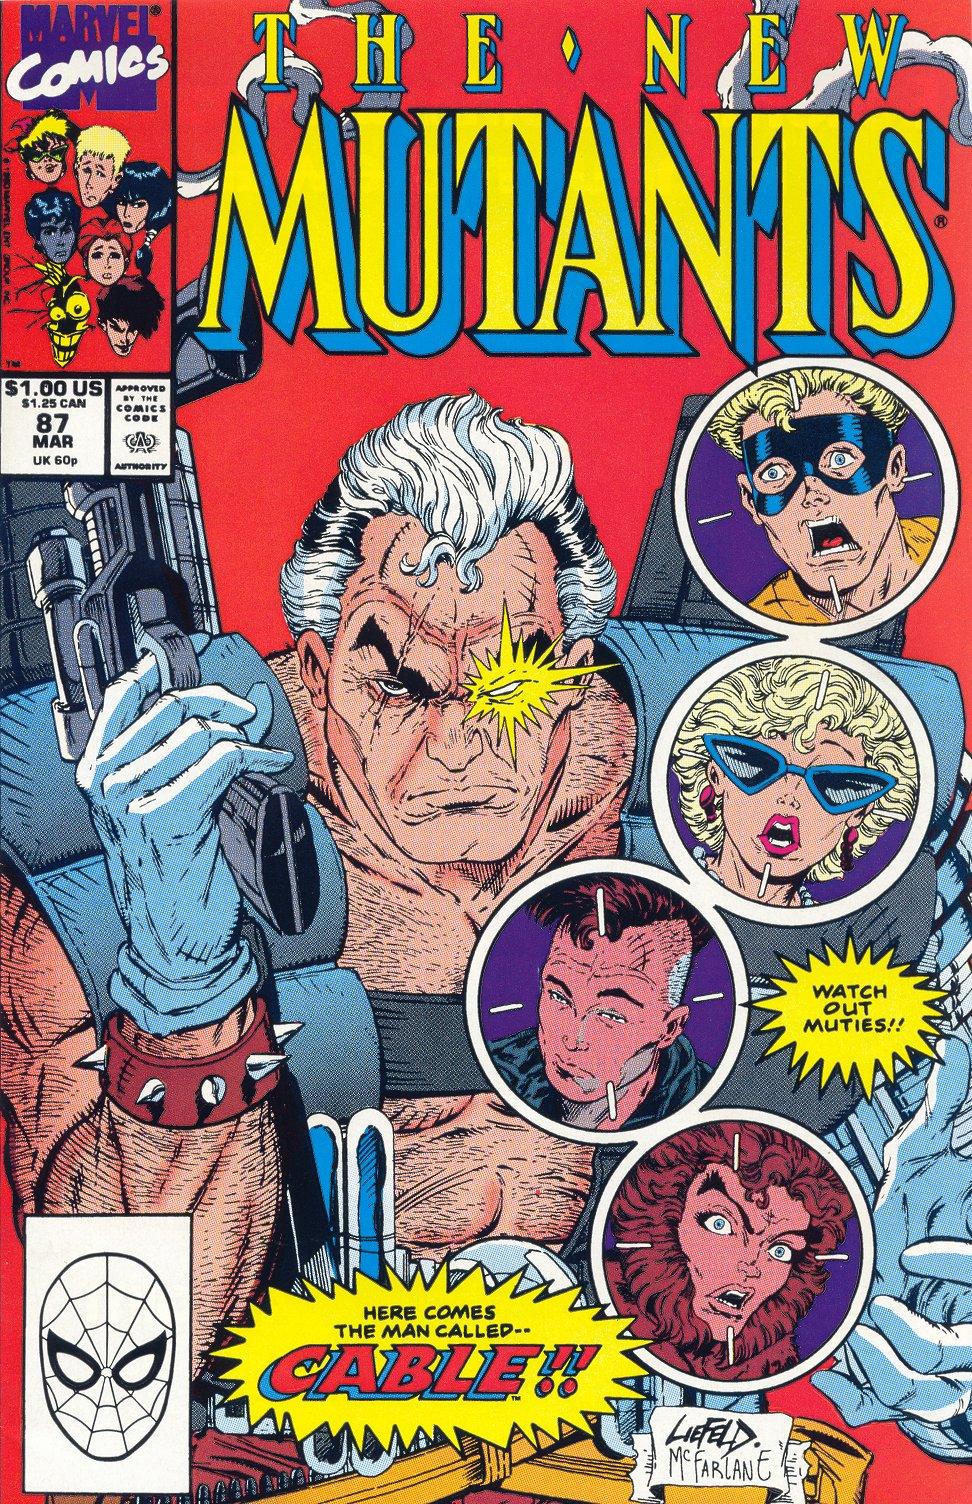 New_Mutants_Vol_1_87.jpg